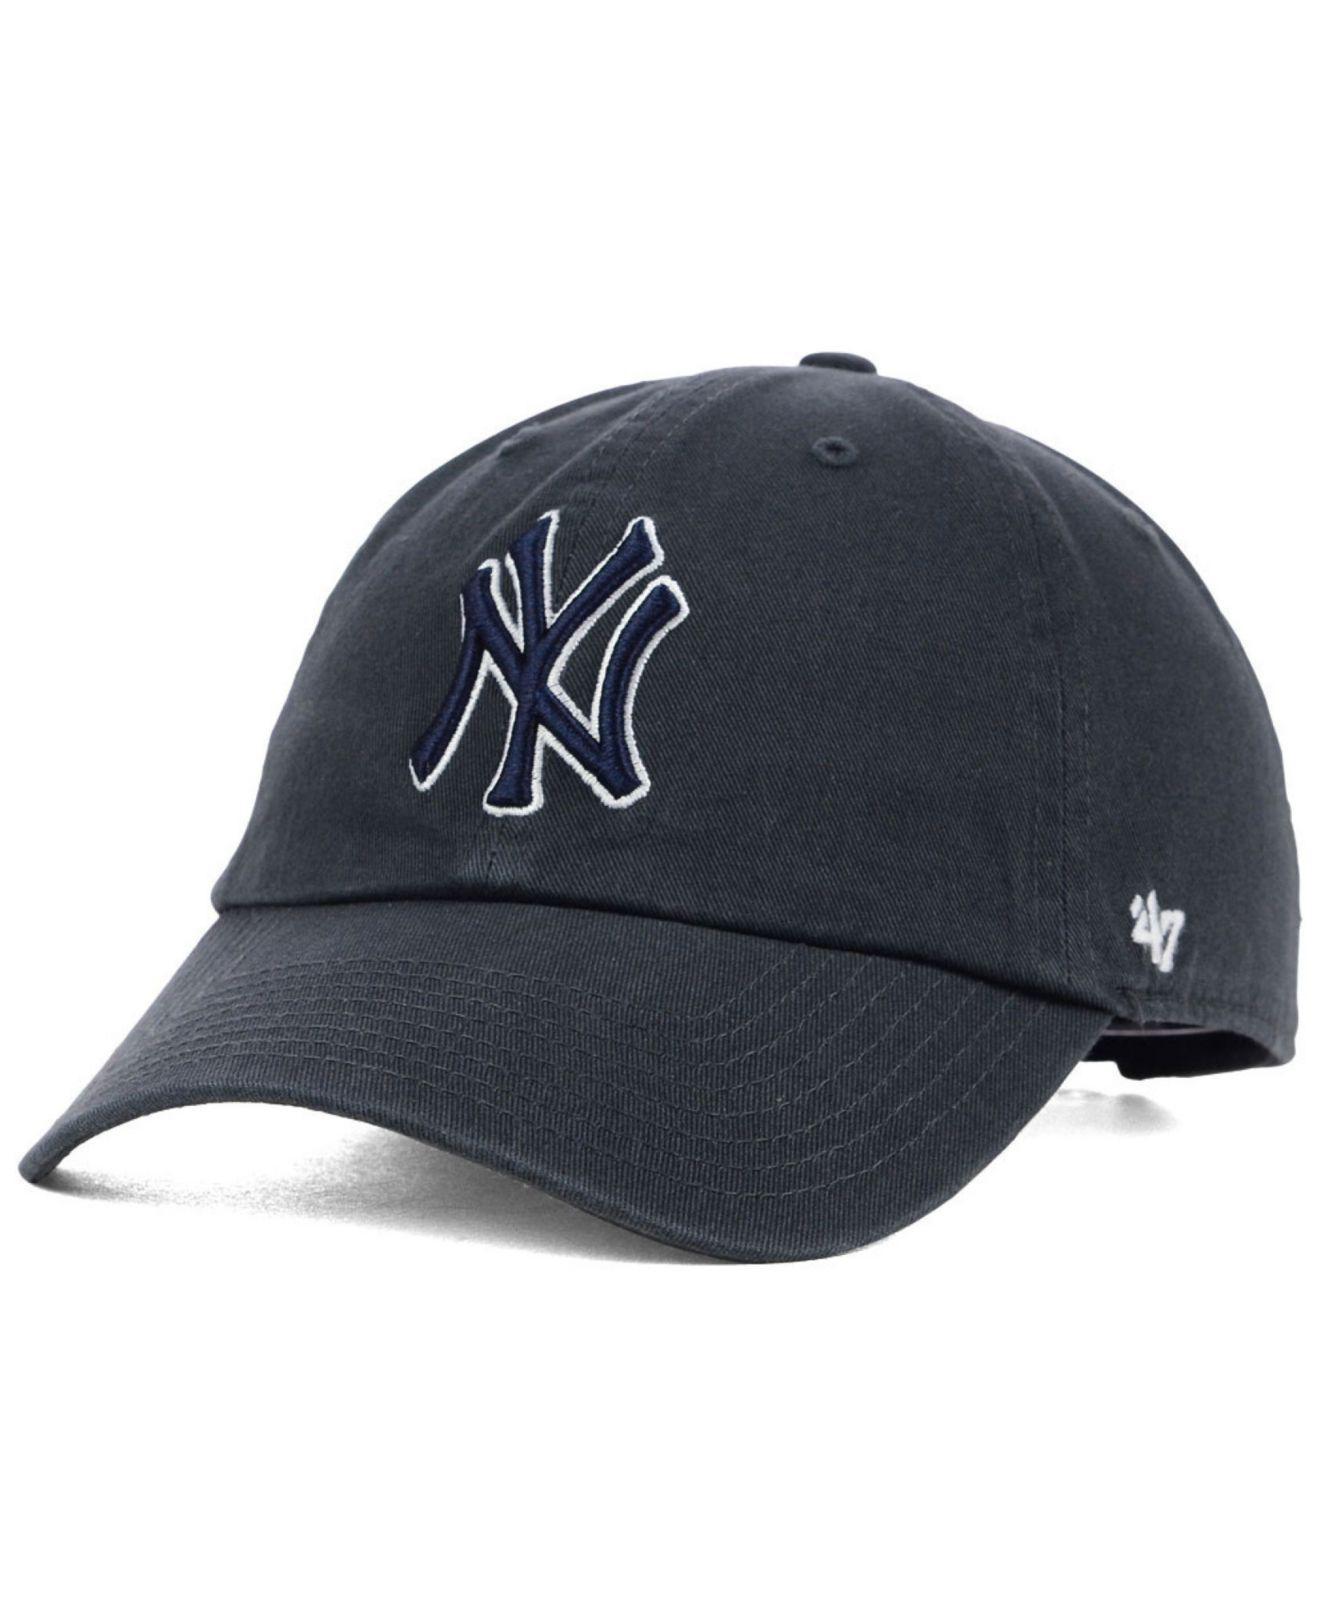 8b12a38b97b Lyst - 47 Brand New York Yankees Clean Up Cap in Gray for Men